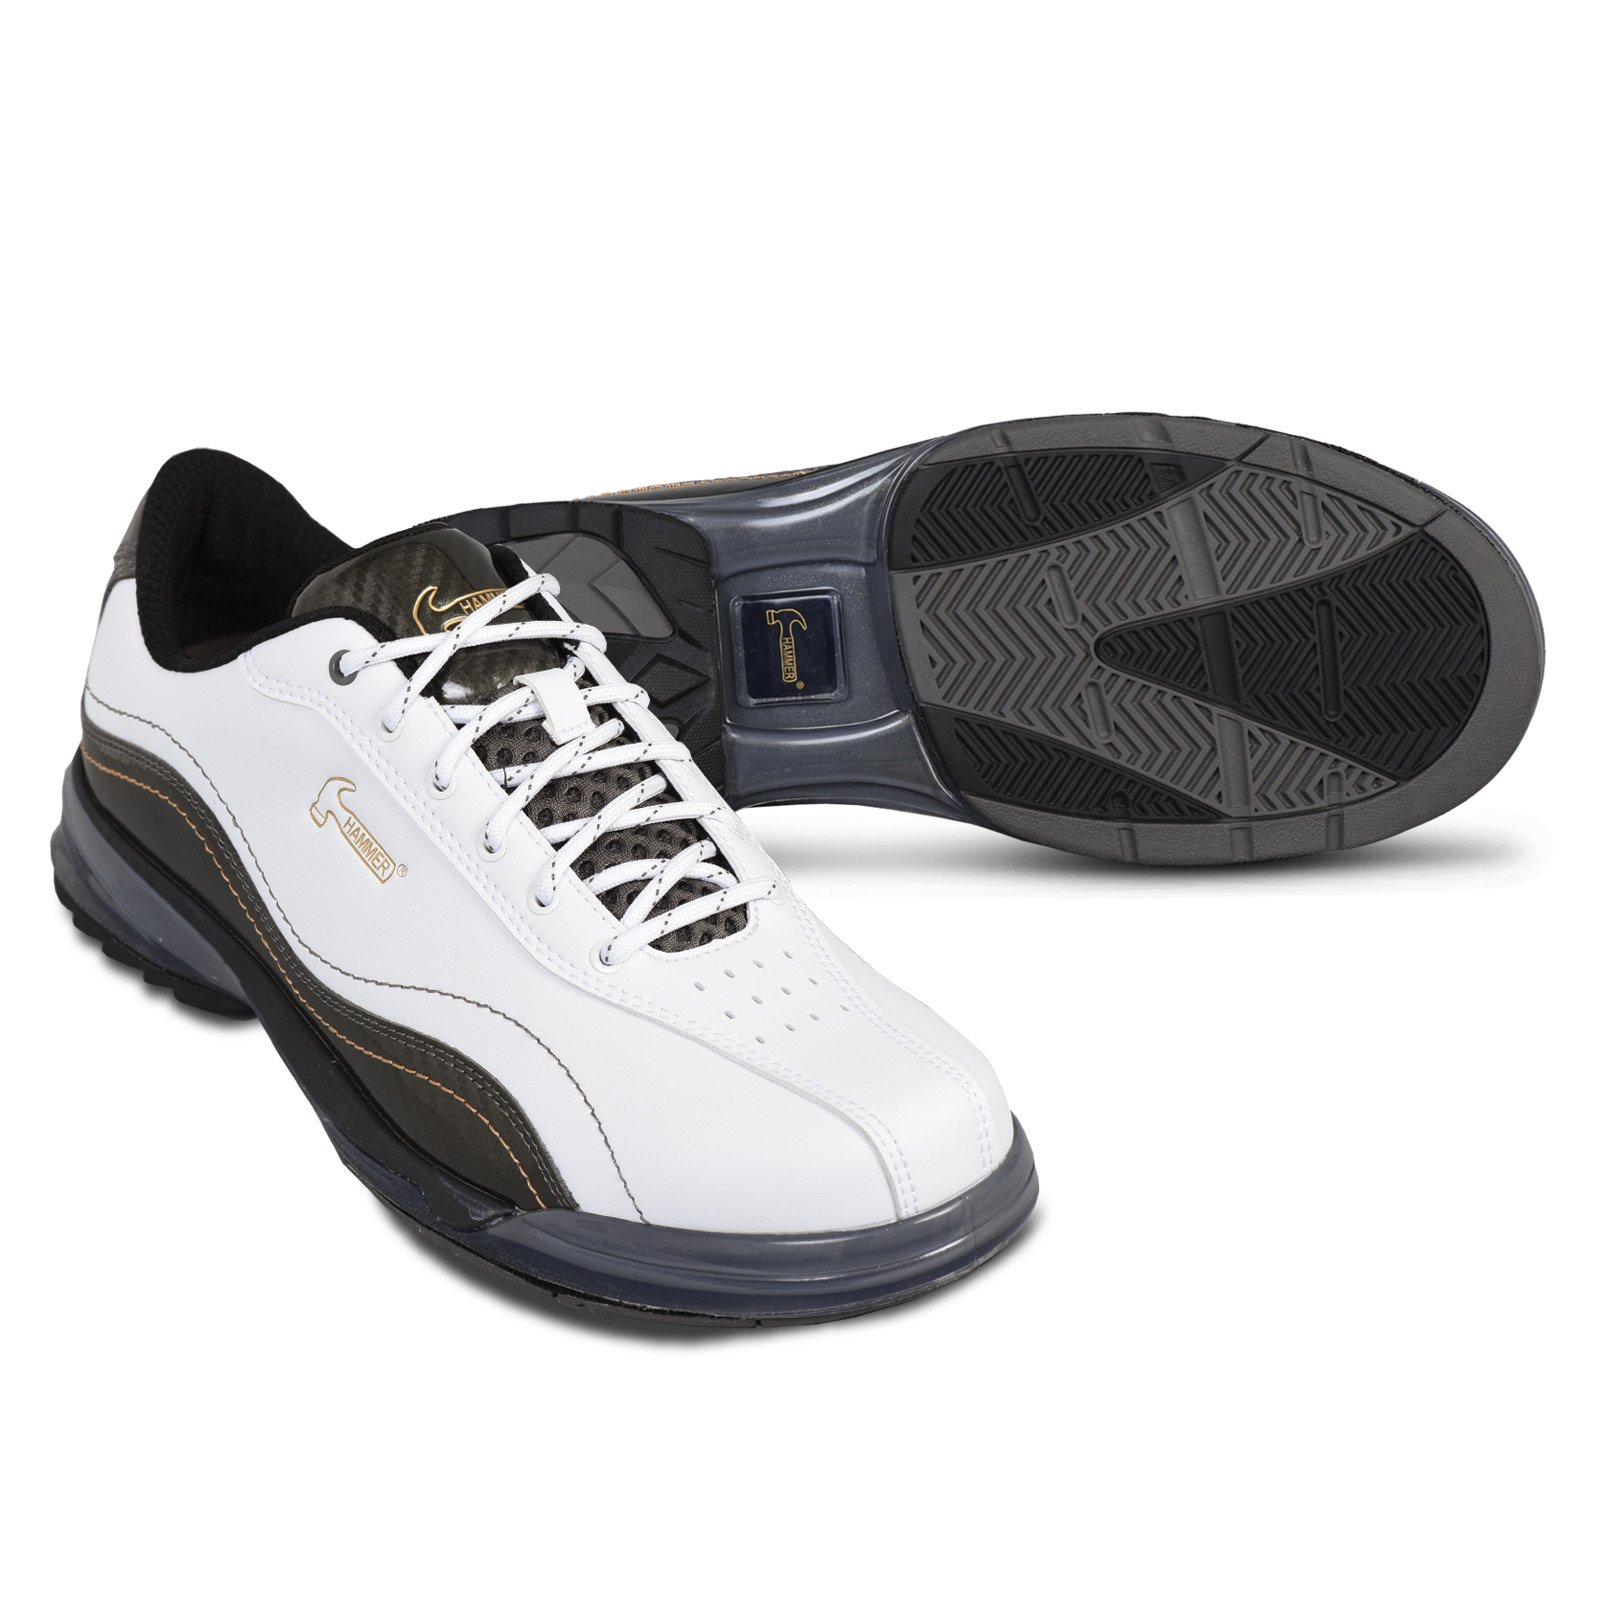 KR Strikeforce Men's Hammer Performance Bowling Shoes, White/Carbon, Size 10.5 by KR Strikeforce